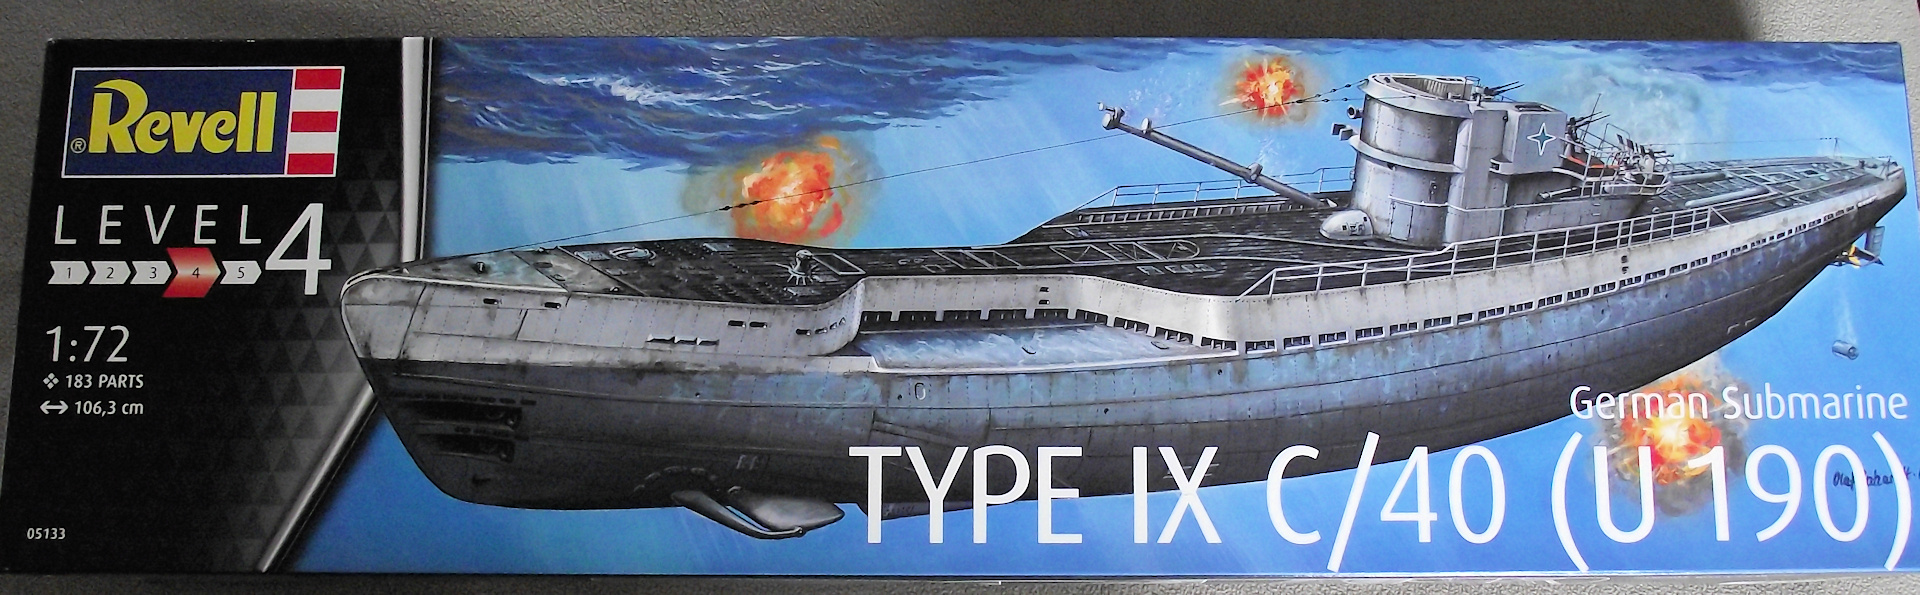 U Boot type IX 1/72 revell 605589UbootRevell1x721